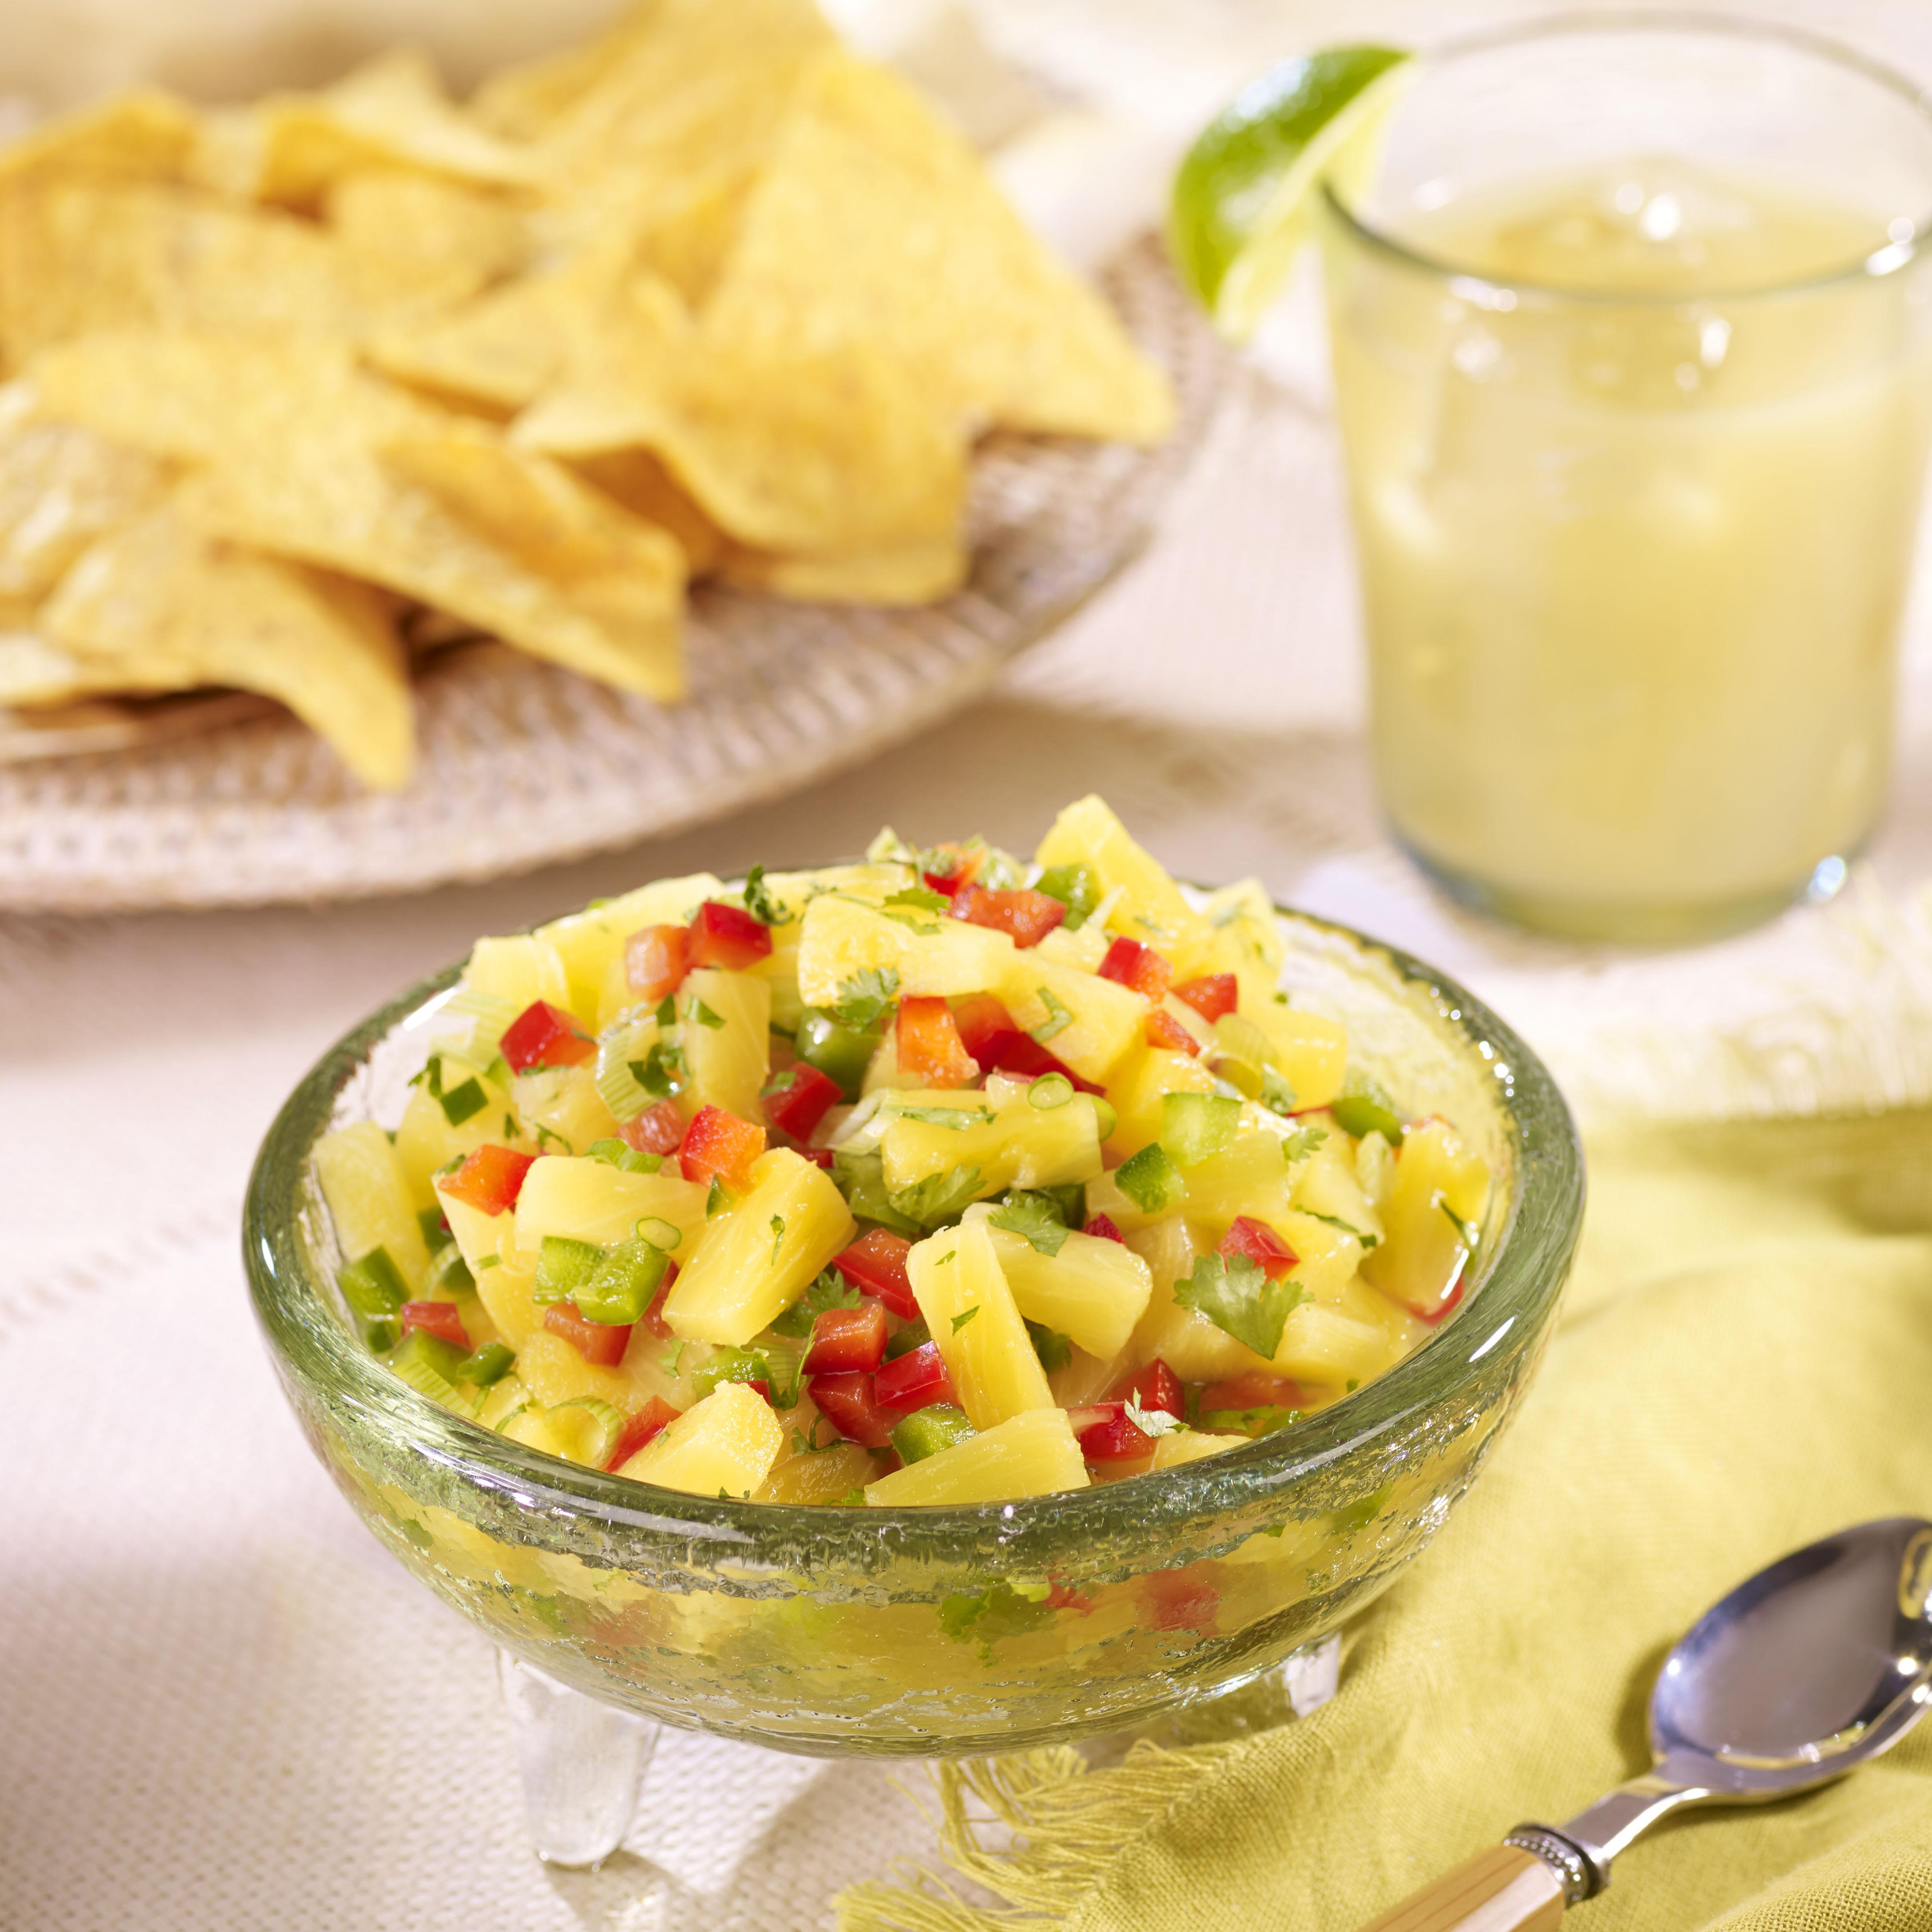 Spunky Pineapple Salsa